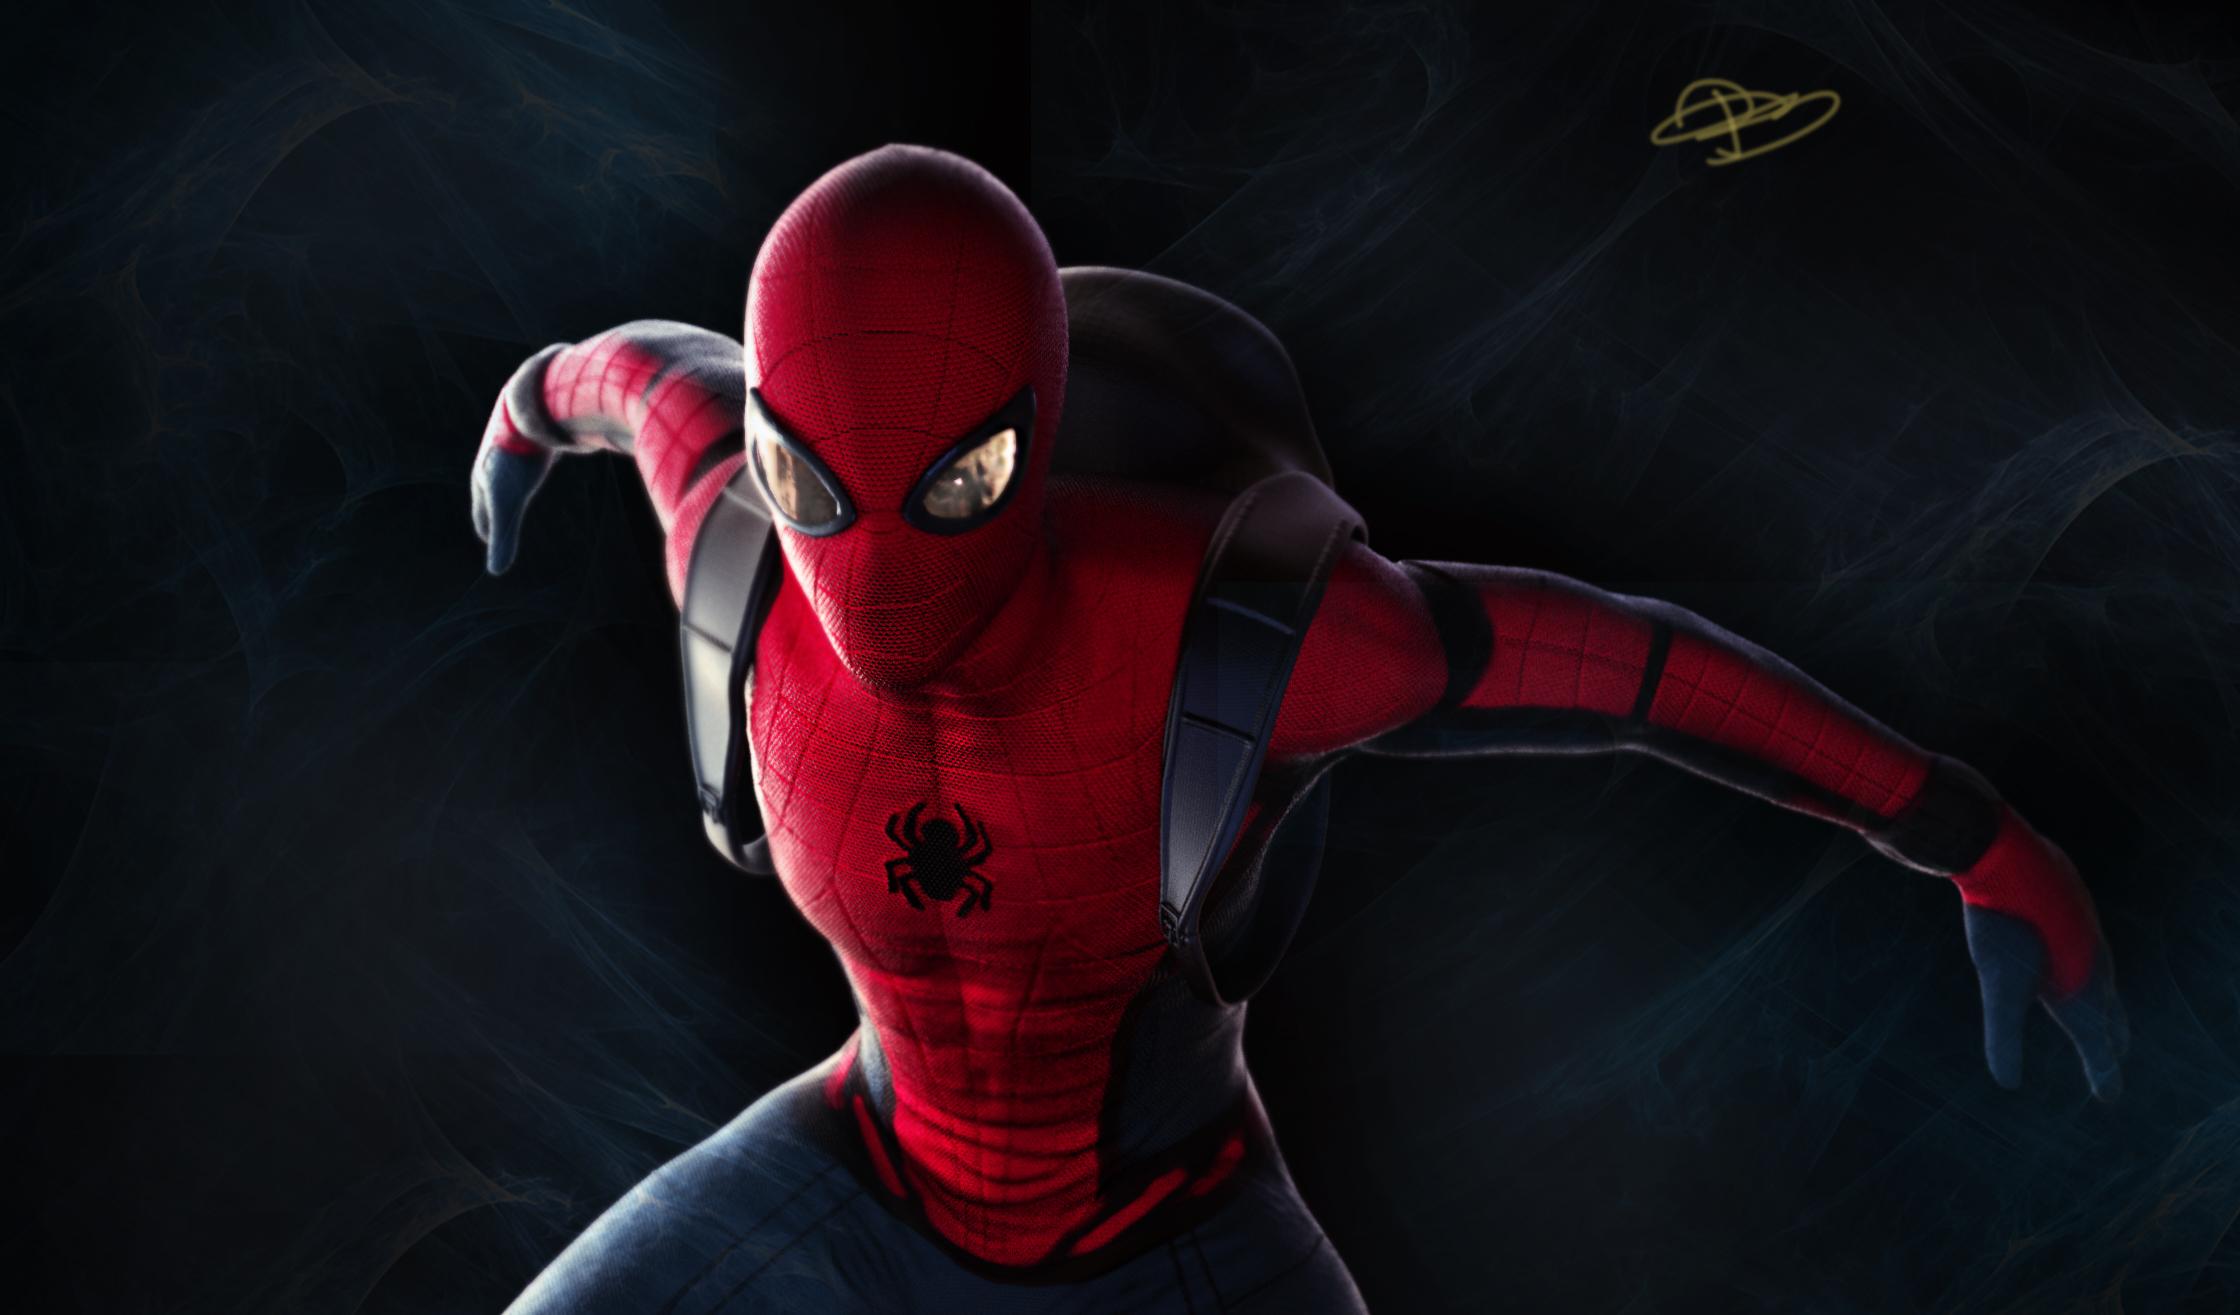 Wallpaper Spider Man 2099 Fan Art 4k Creative Graphics: Spiderman Artwork 2018, HD Superheroes, 4k Wallpapers